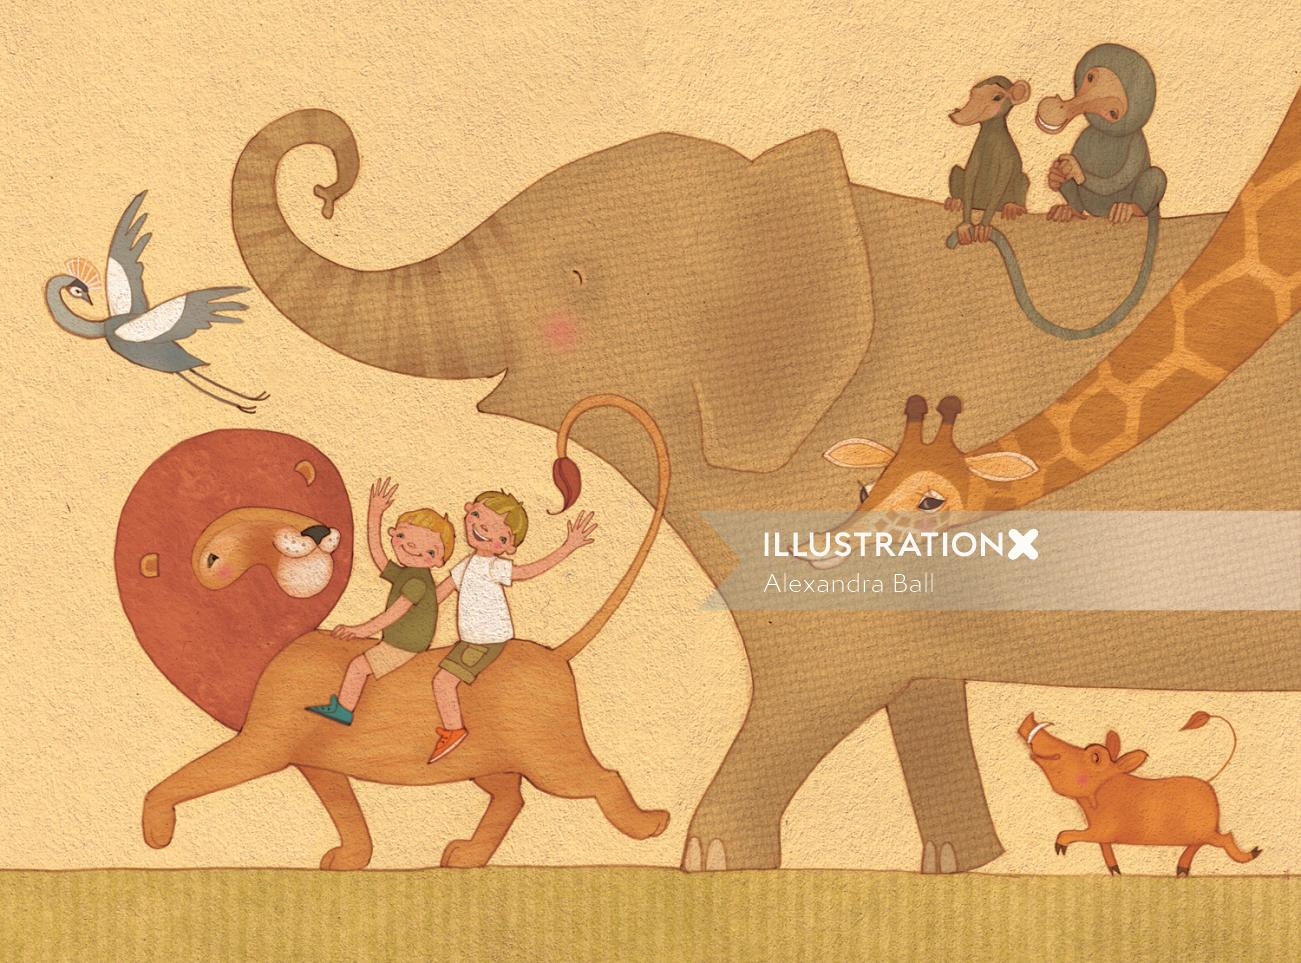 Alexandra Ball: Safari boys illustration